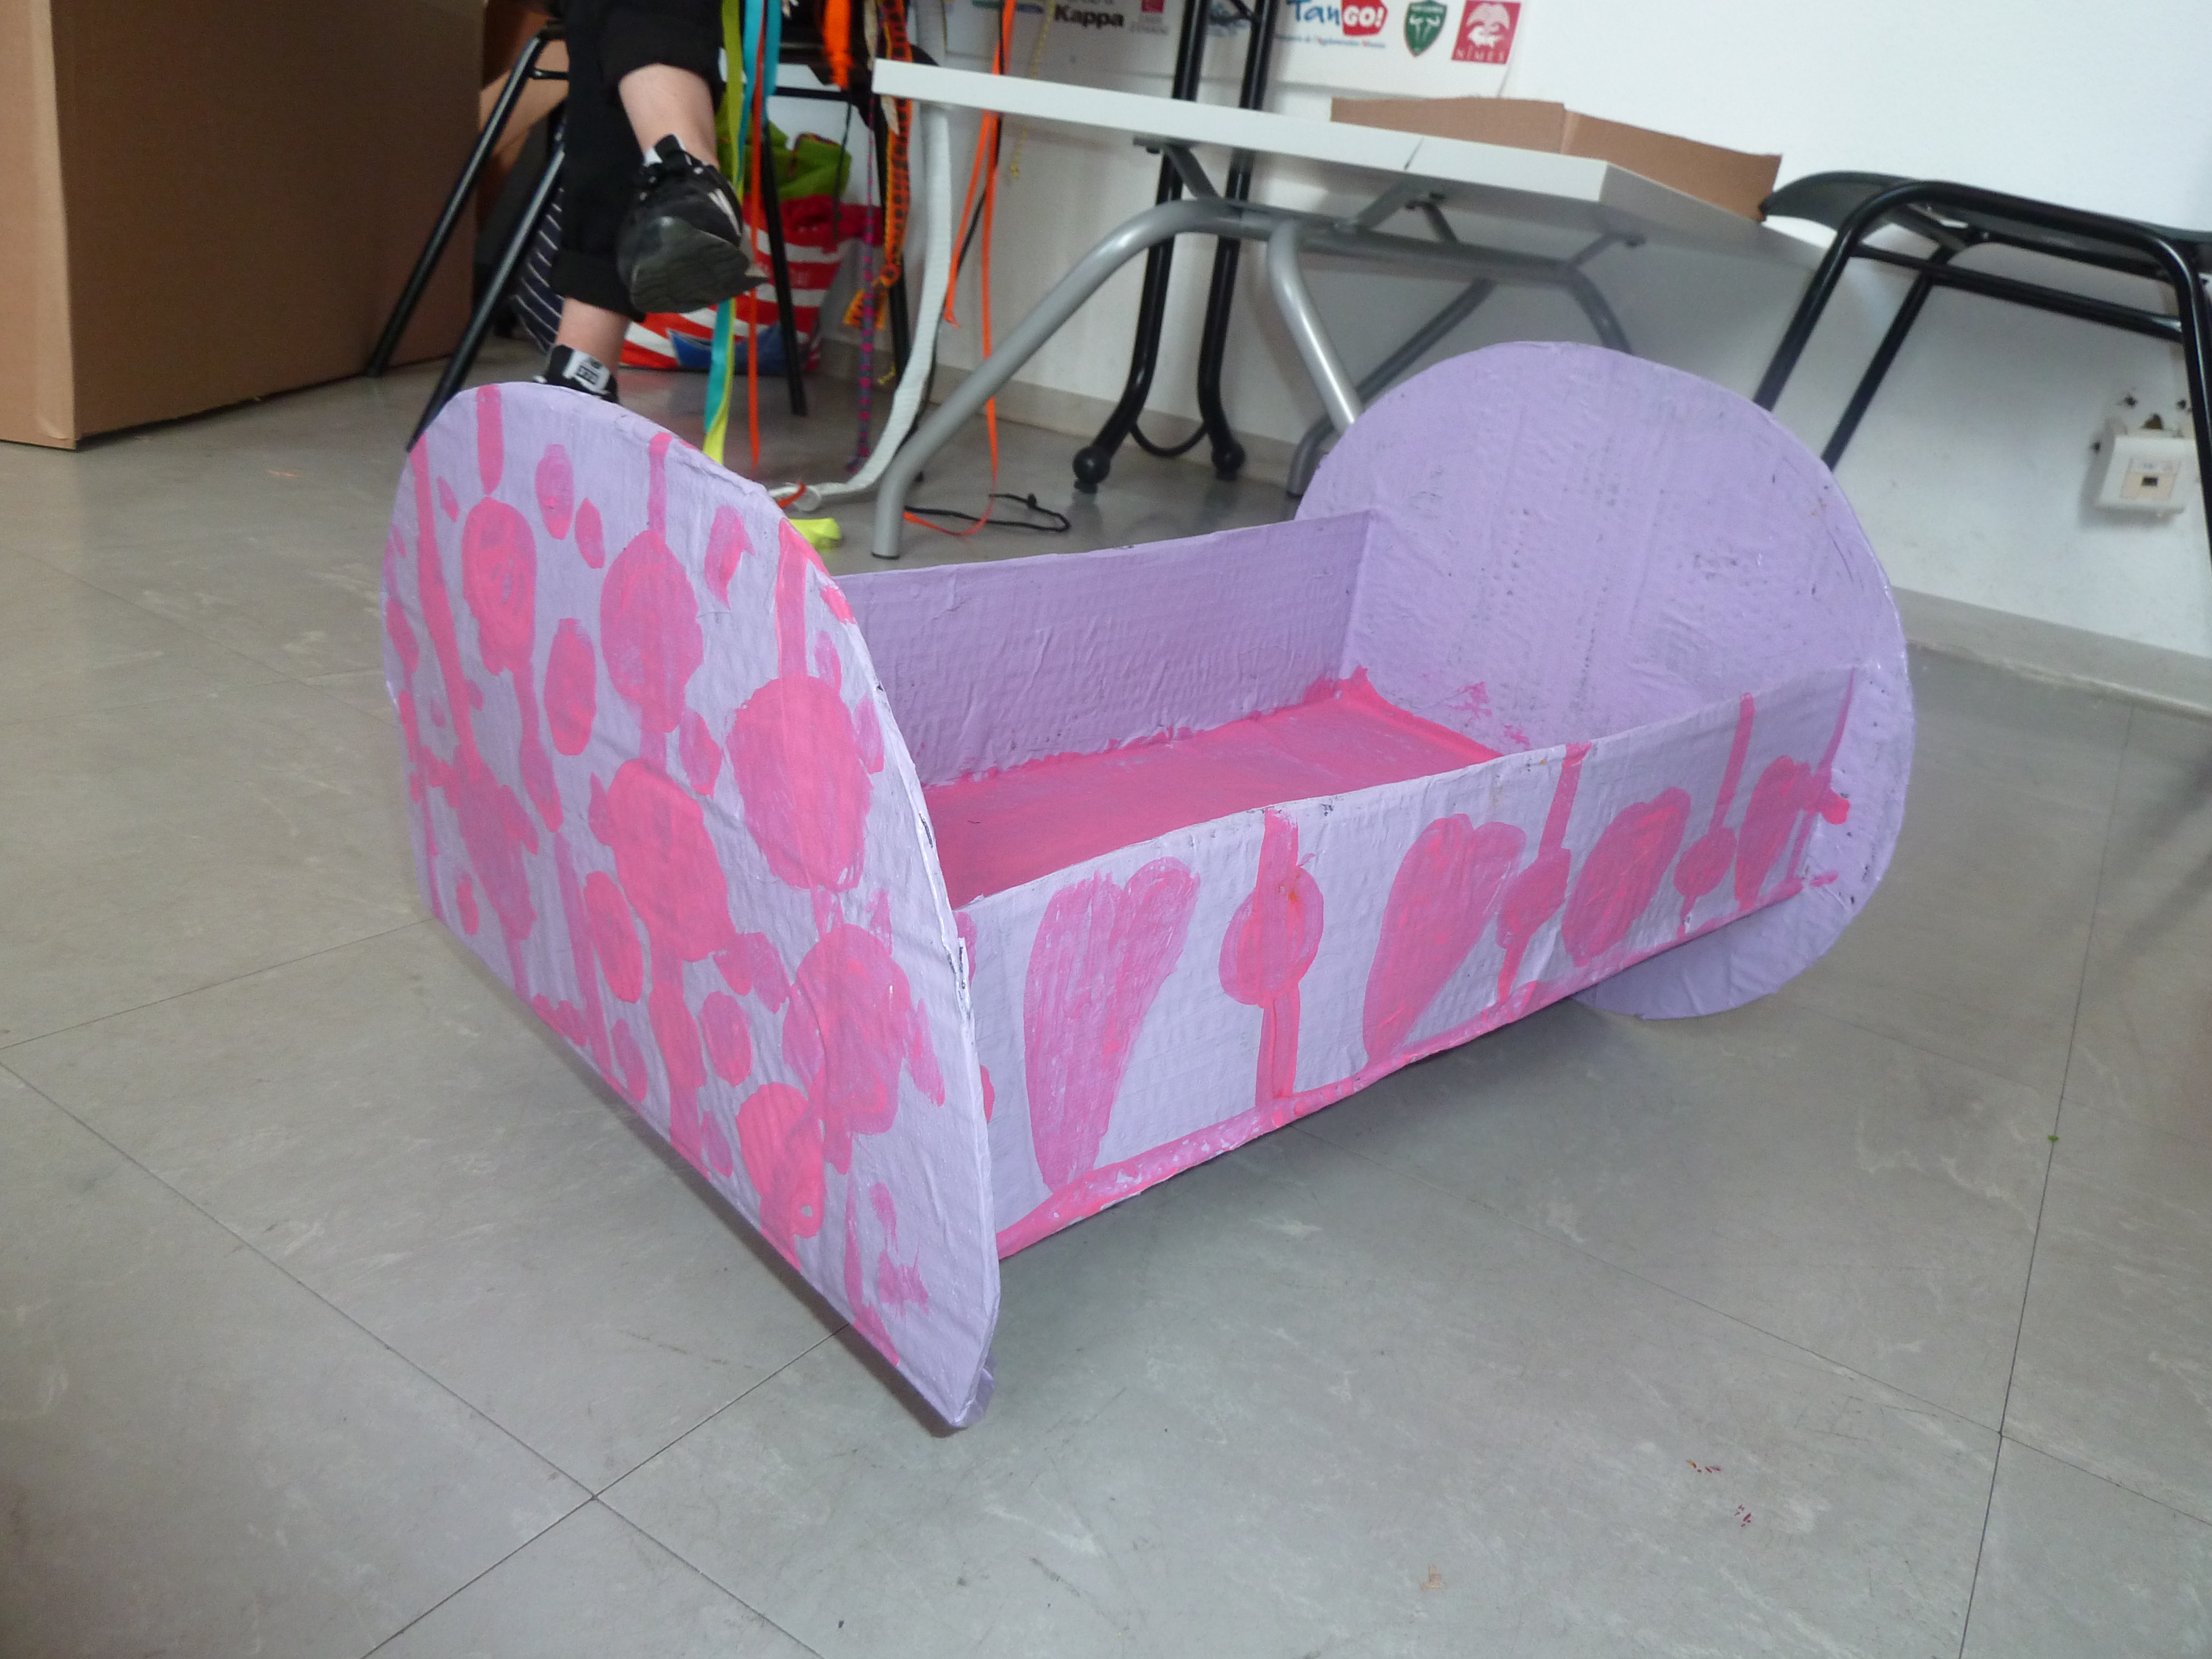 fabrication de jeux gm98 montrealeast. Black Bedroom Furniture Sets. Home Design Ideas